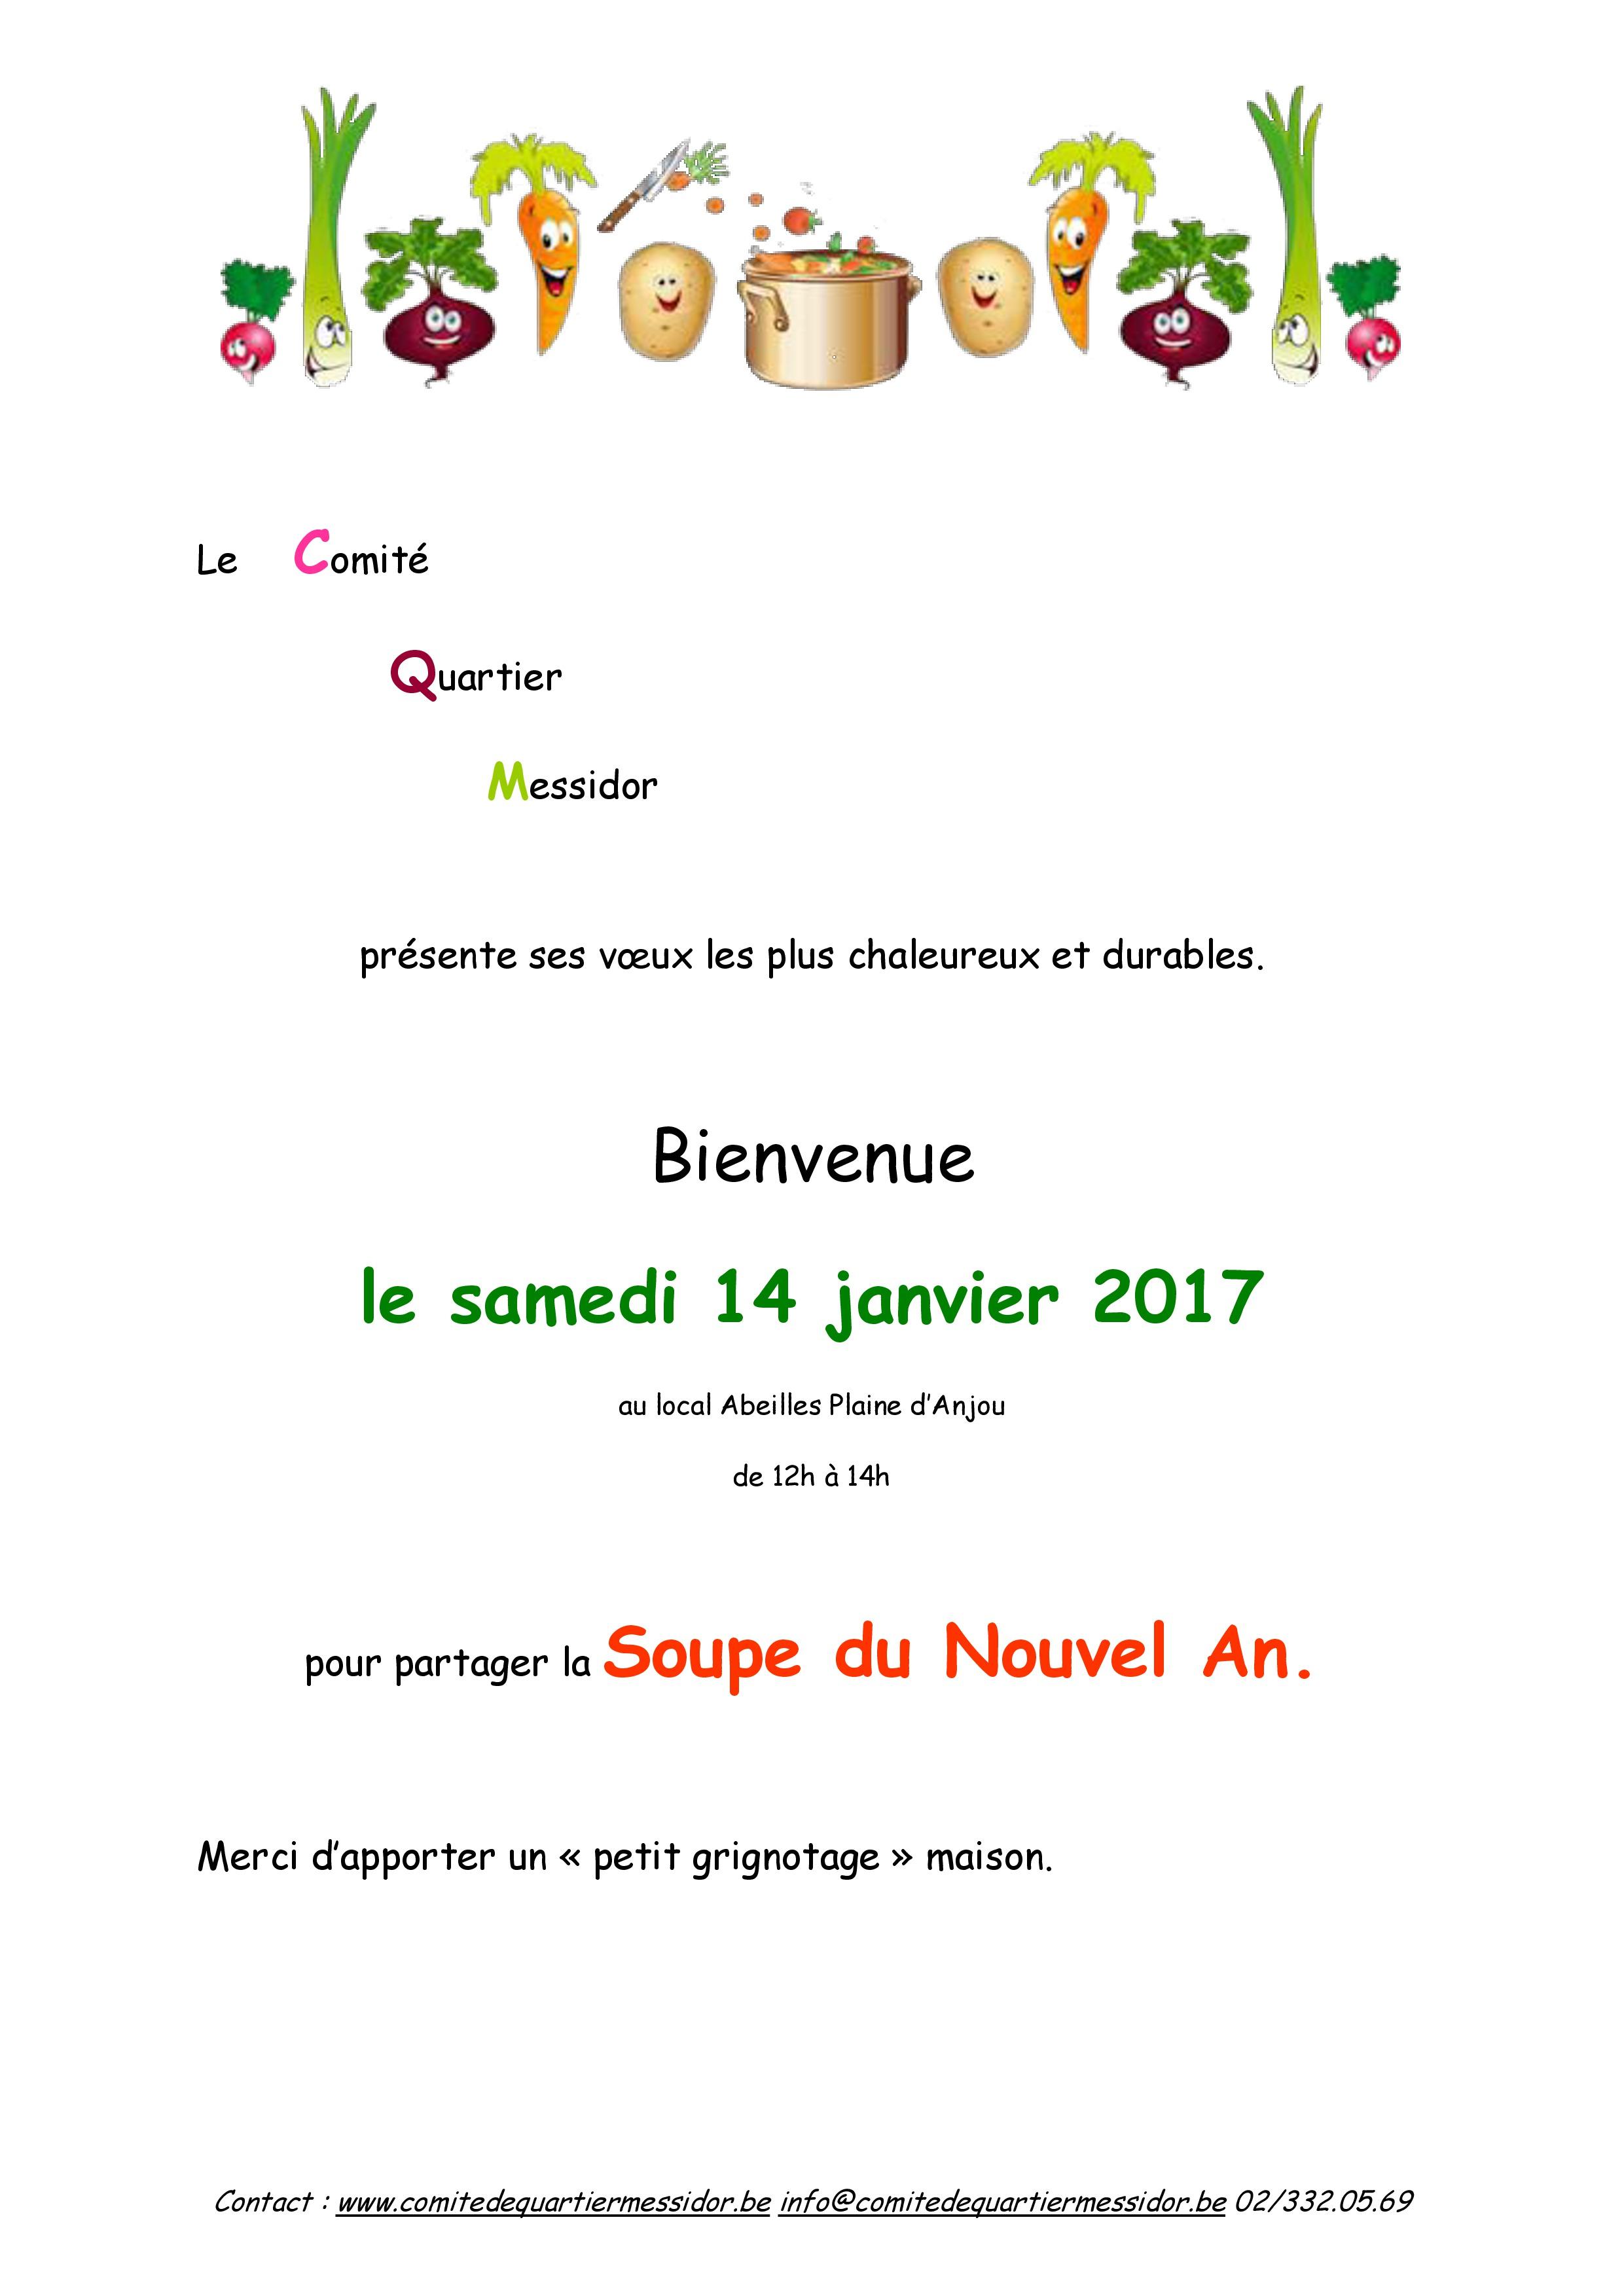 invitationa4